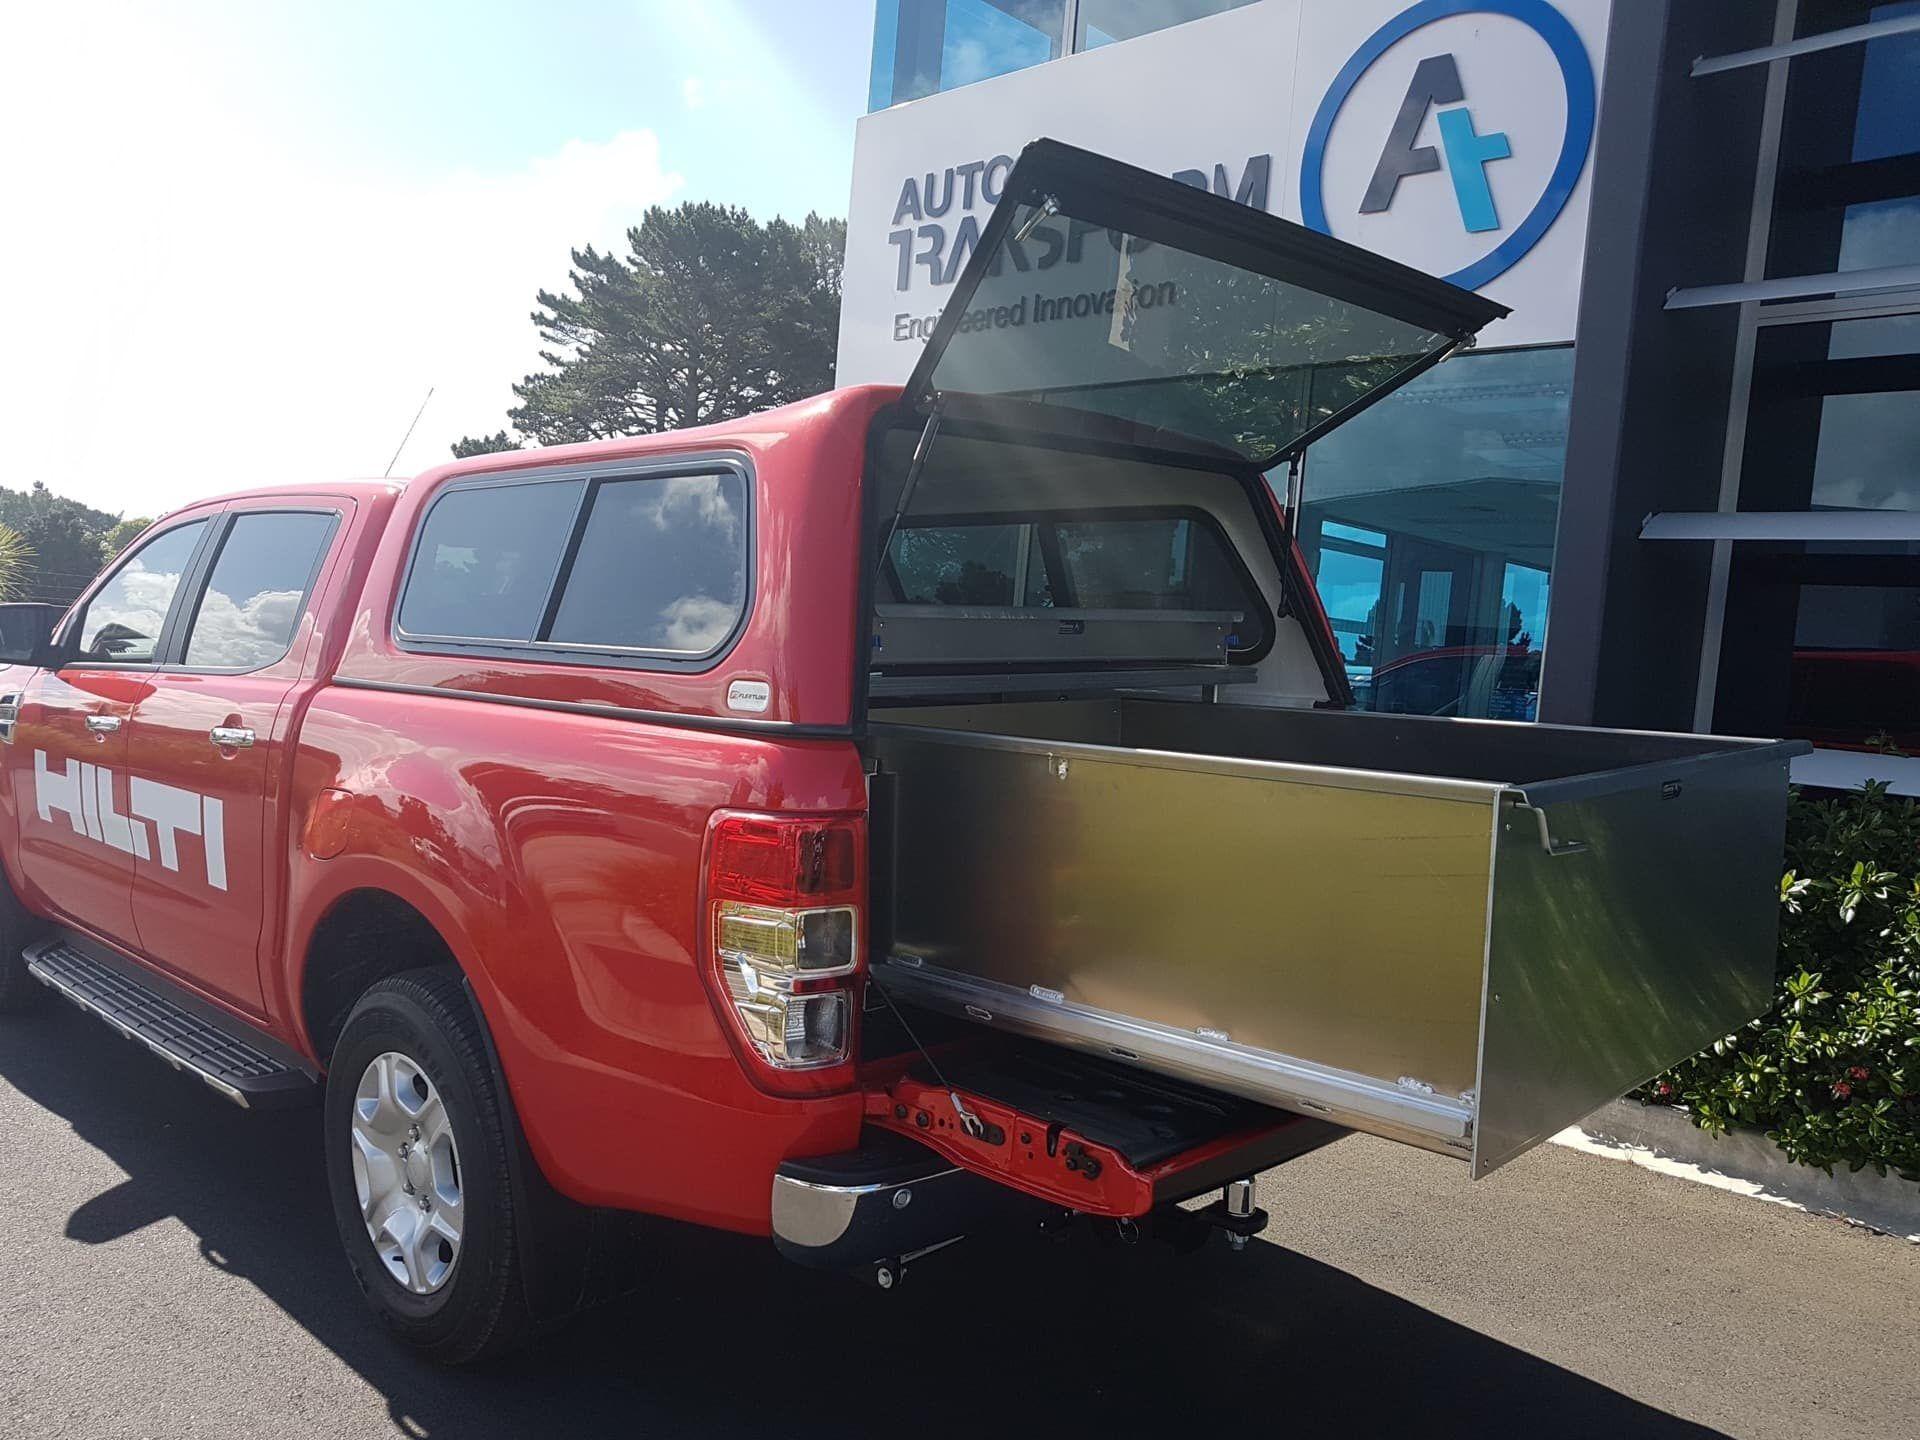 Standardised commercial fitout red van